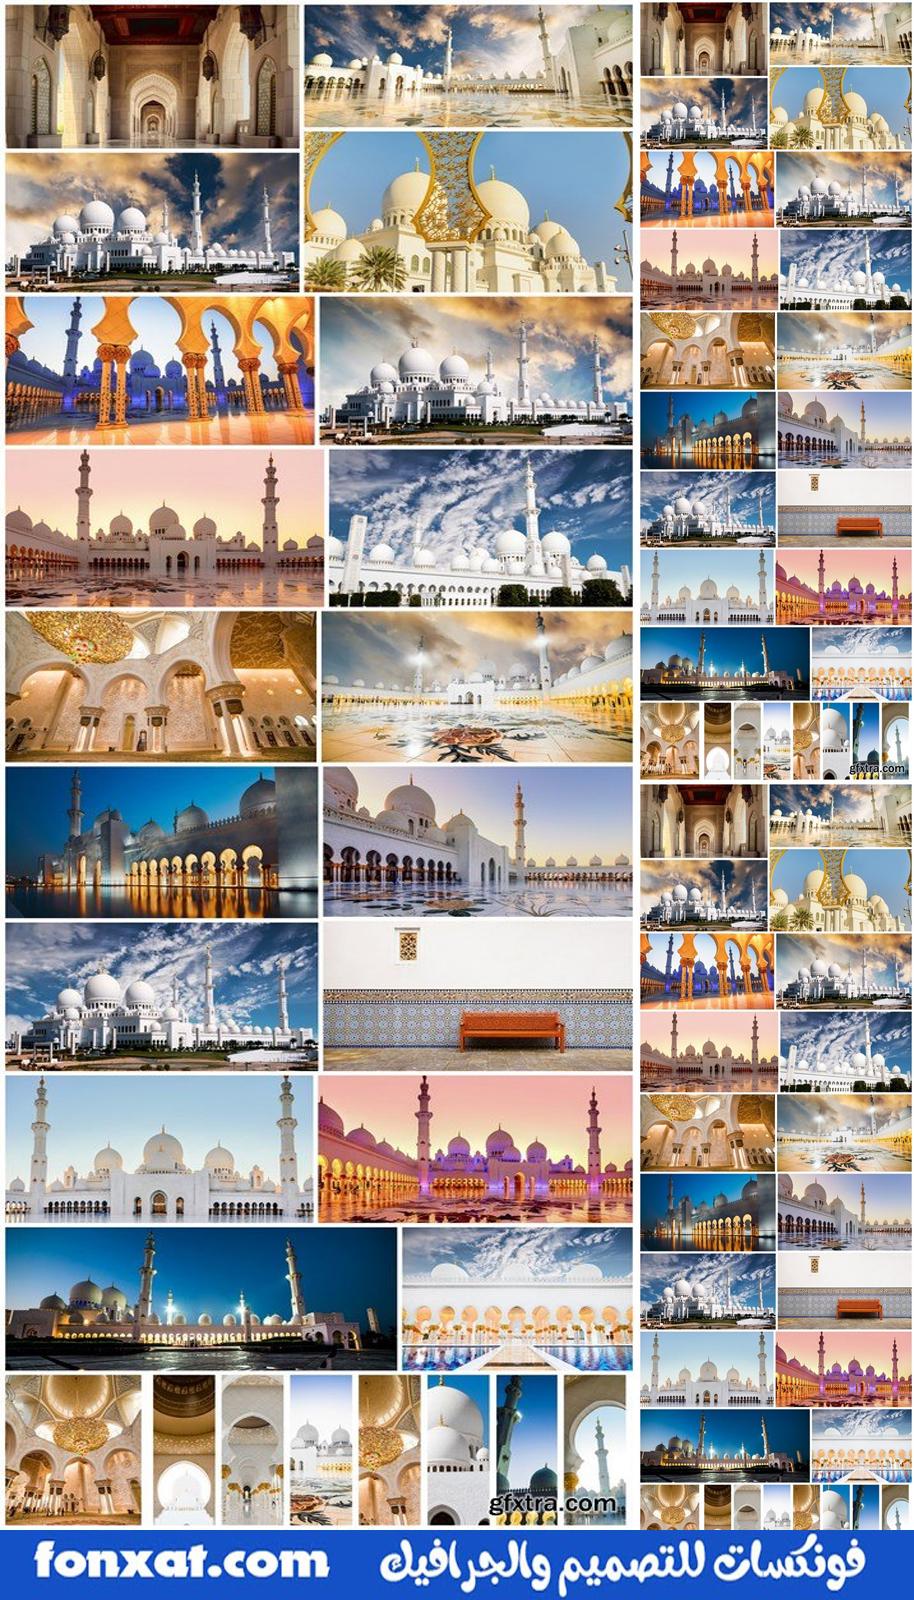 Beautiful arab & islamic architecture 2 - 20xUHQ JPEG